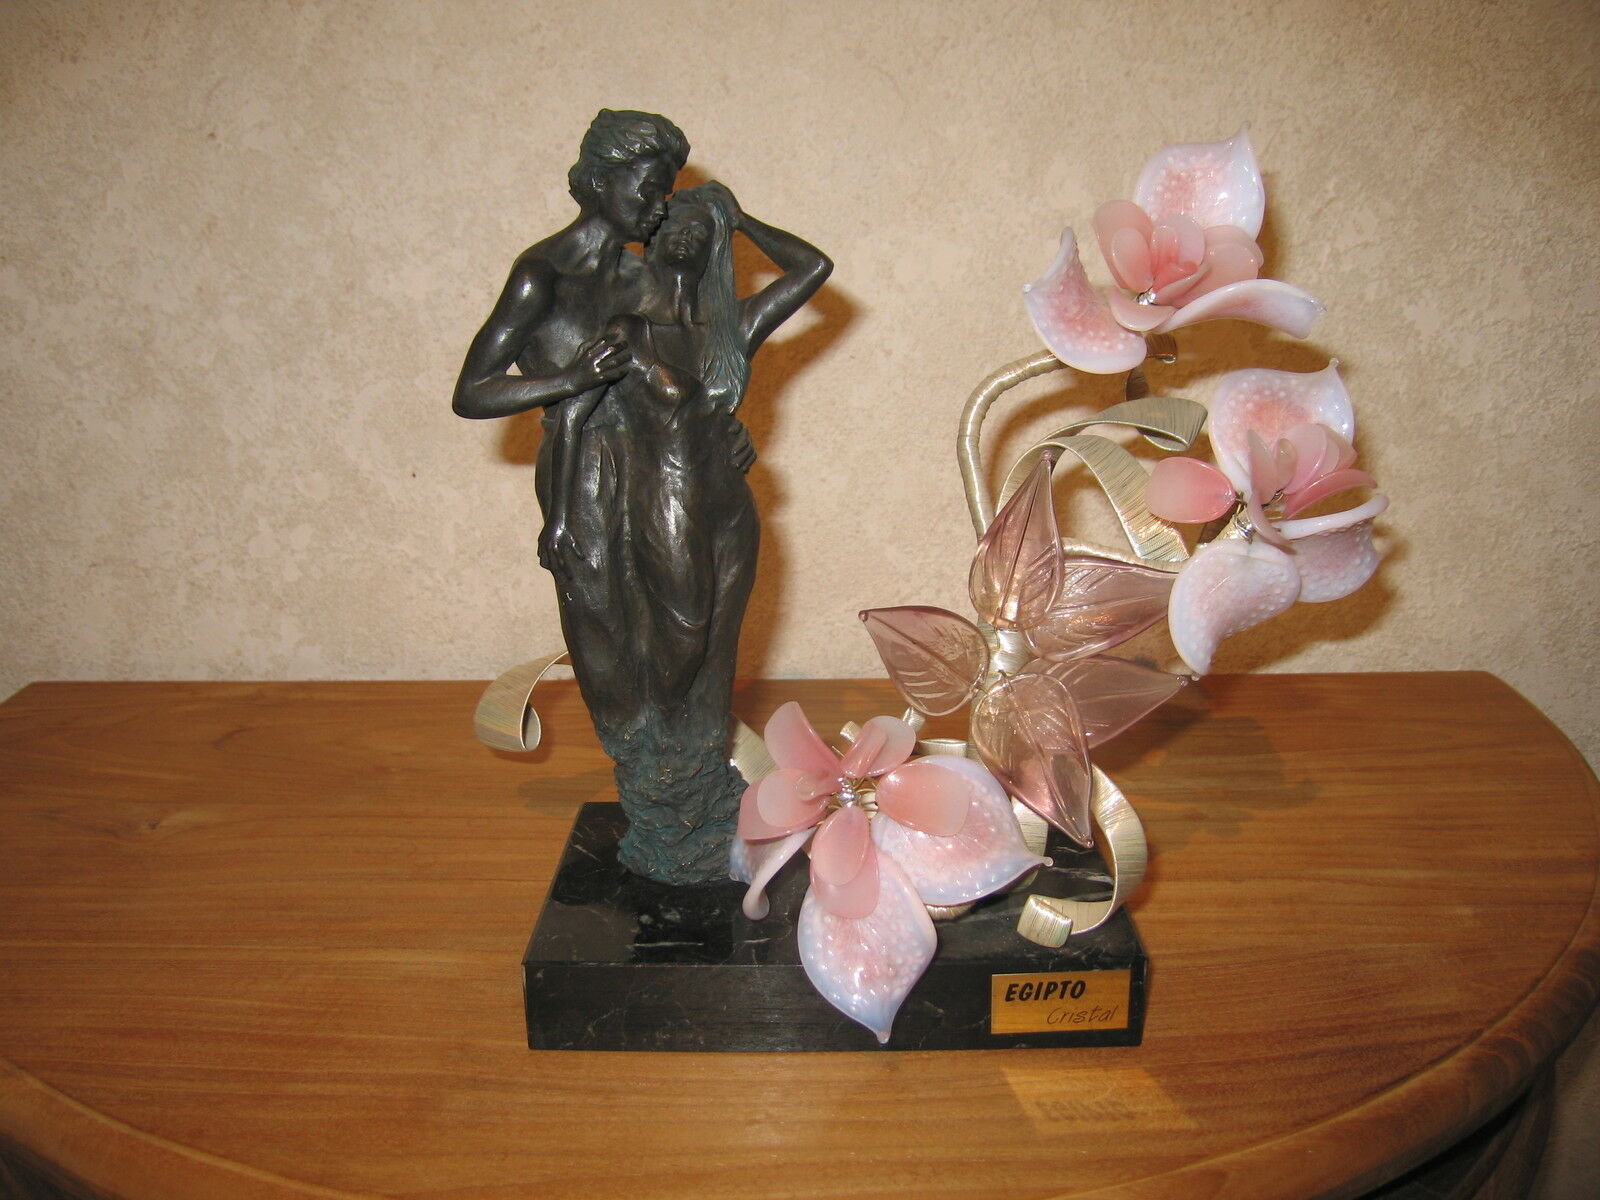 EGIPTO CRISTAL NEW Posture couple fleur Murano 18x11cm H.28cm Flower